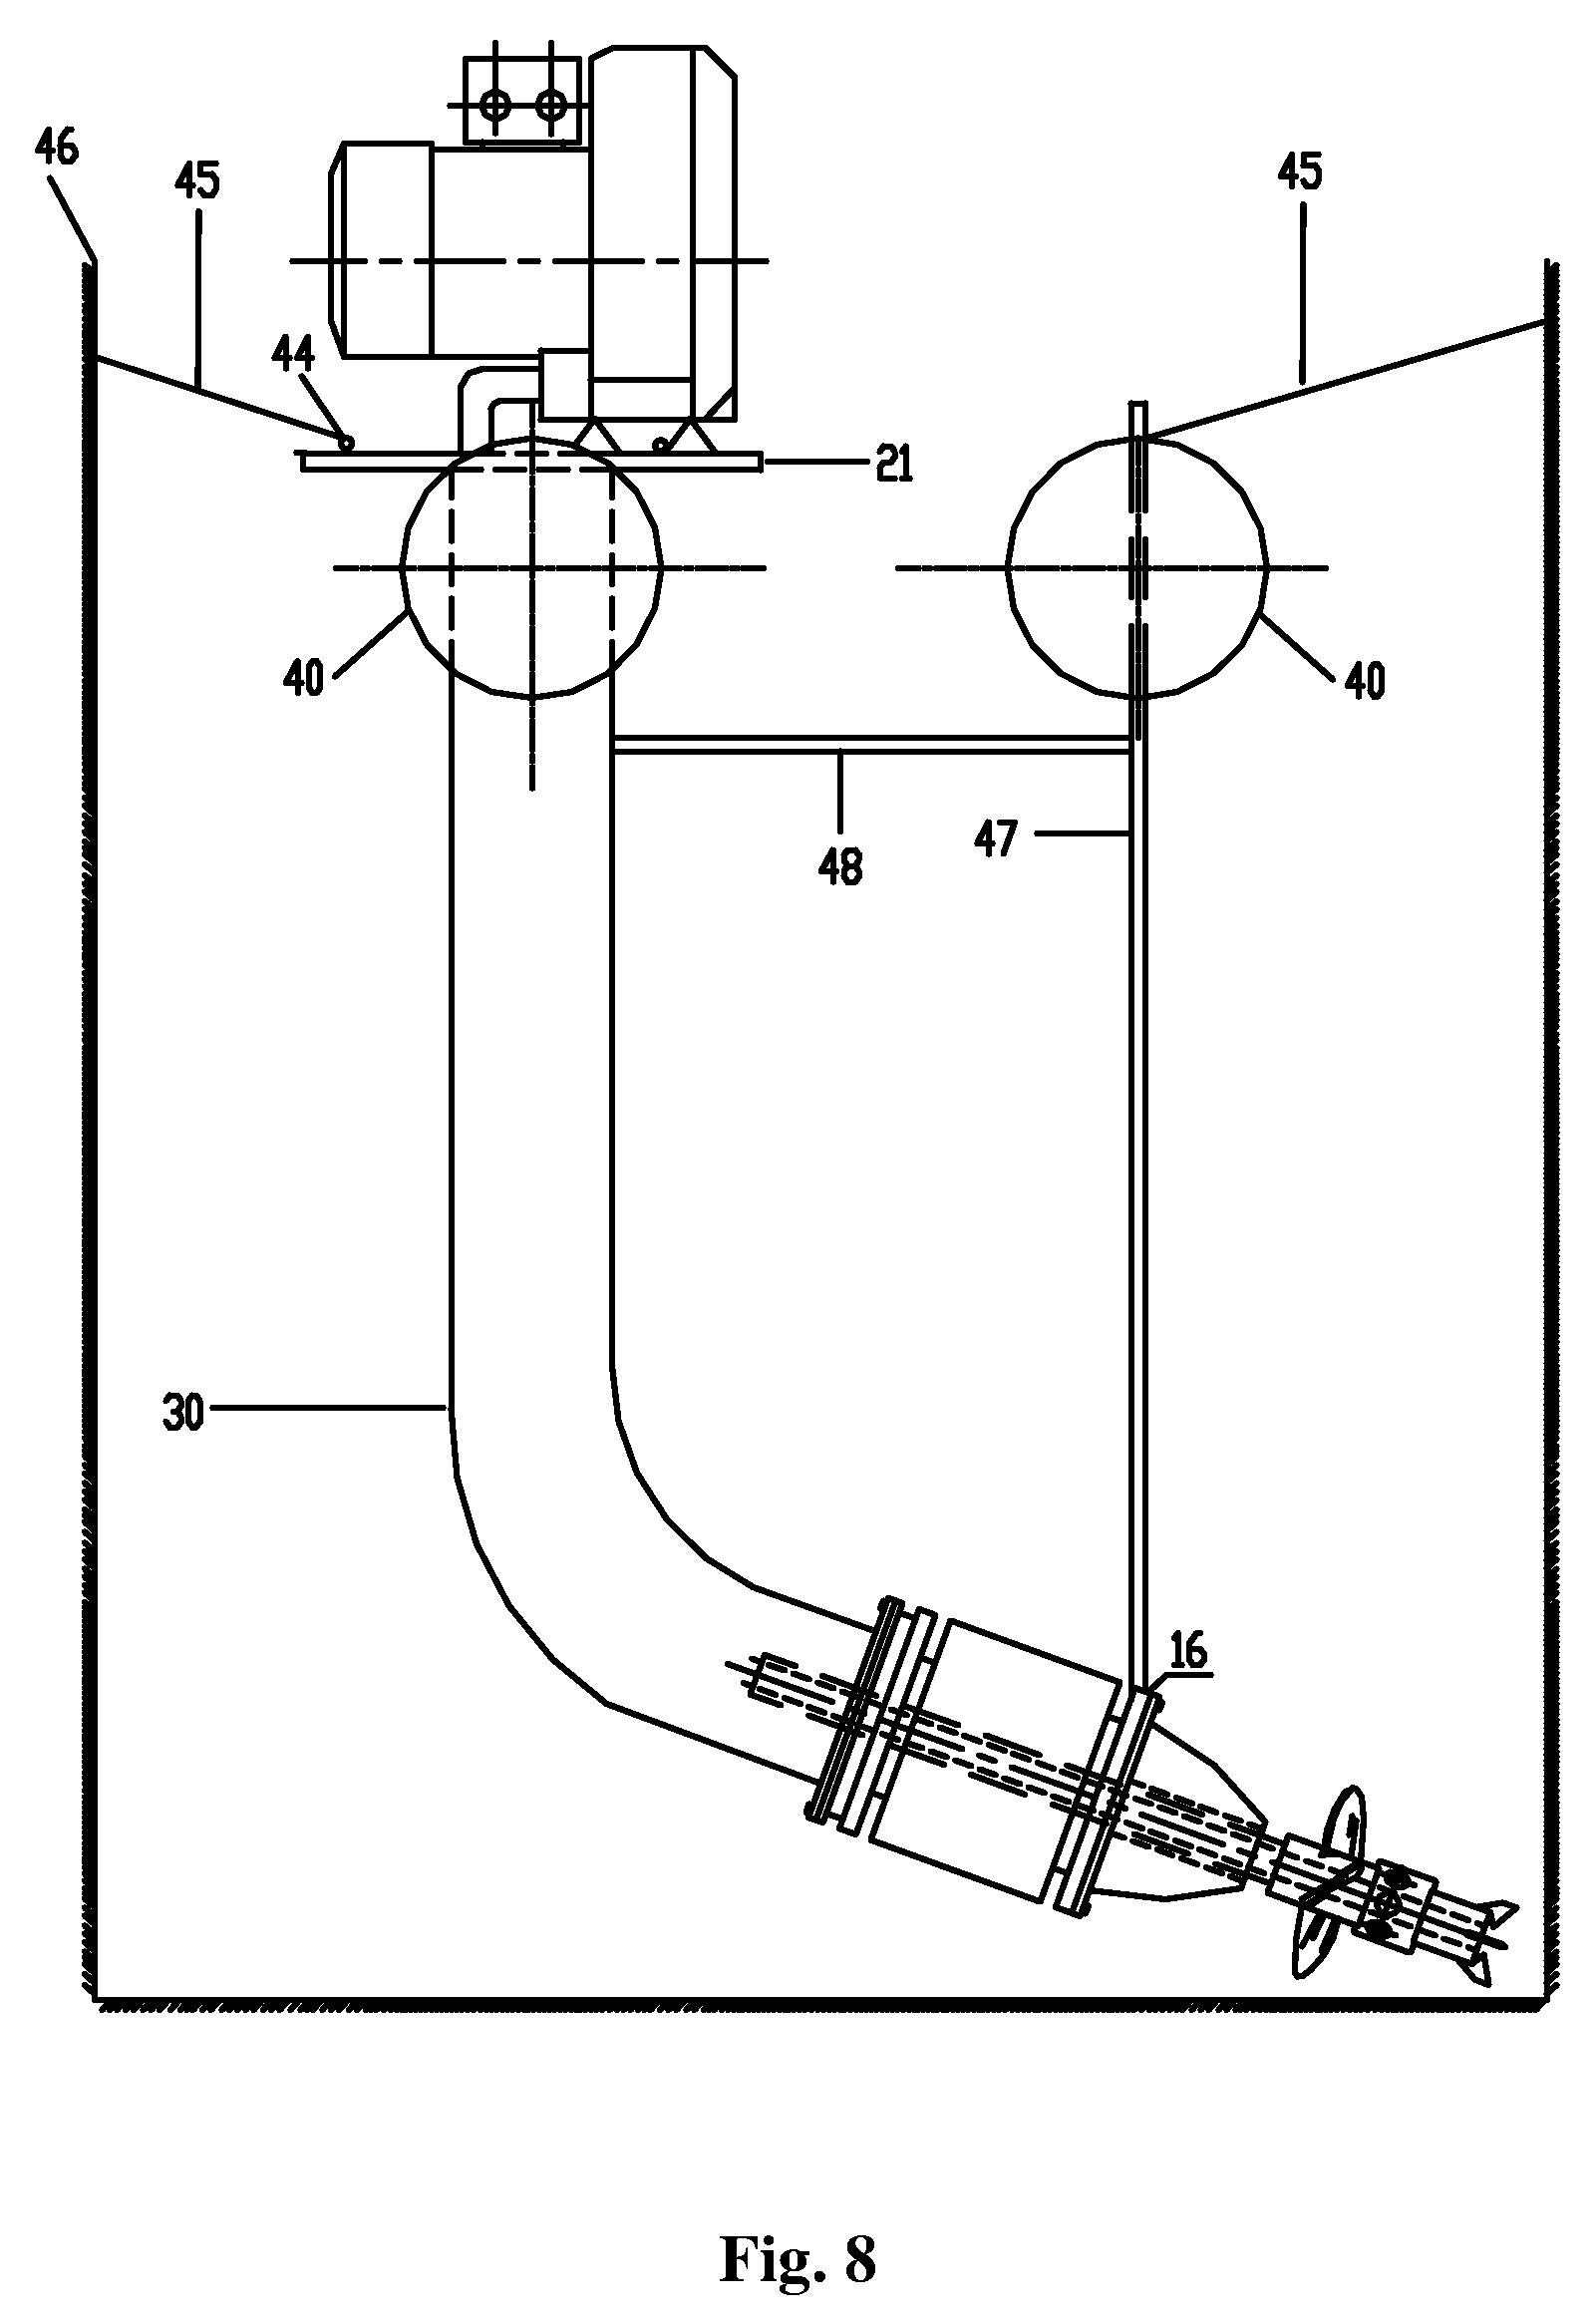 3 Phase Hollow Shaft Motor | Wiring Diagram Database on